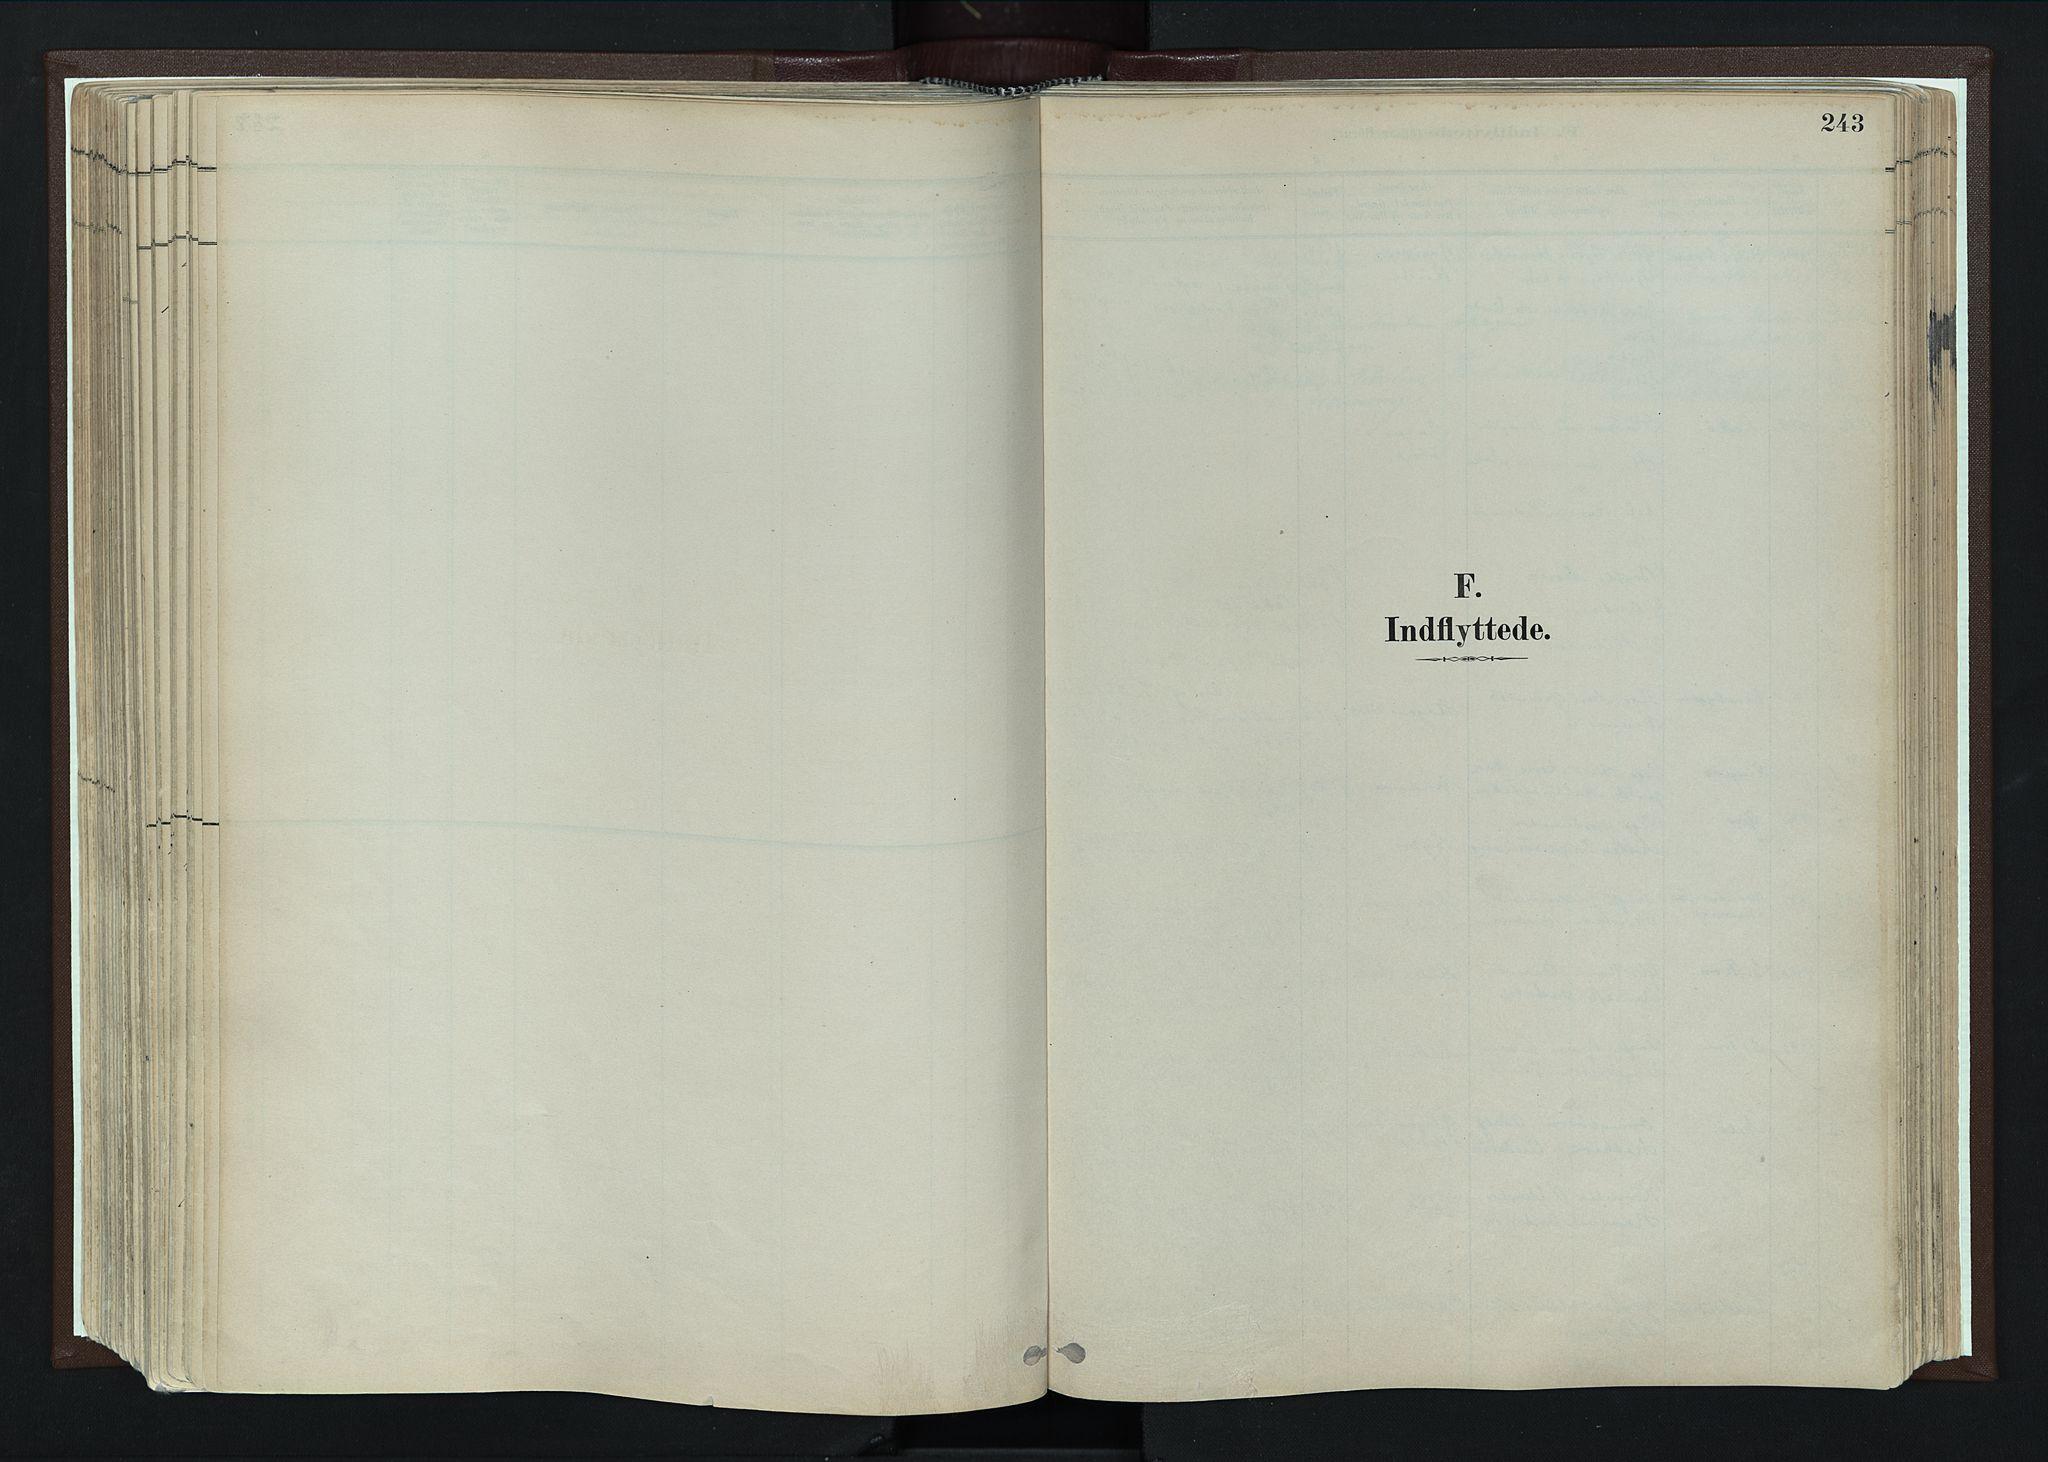 SAH, Nord-Fron prestekontor, Ministerialbok nr. 4, 1884-1914, s. 243